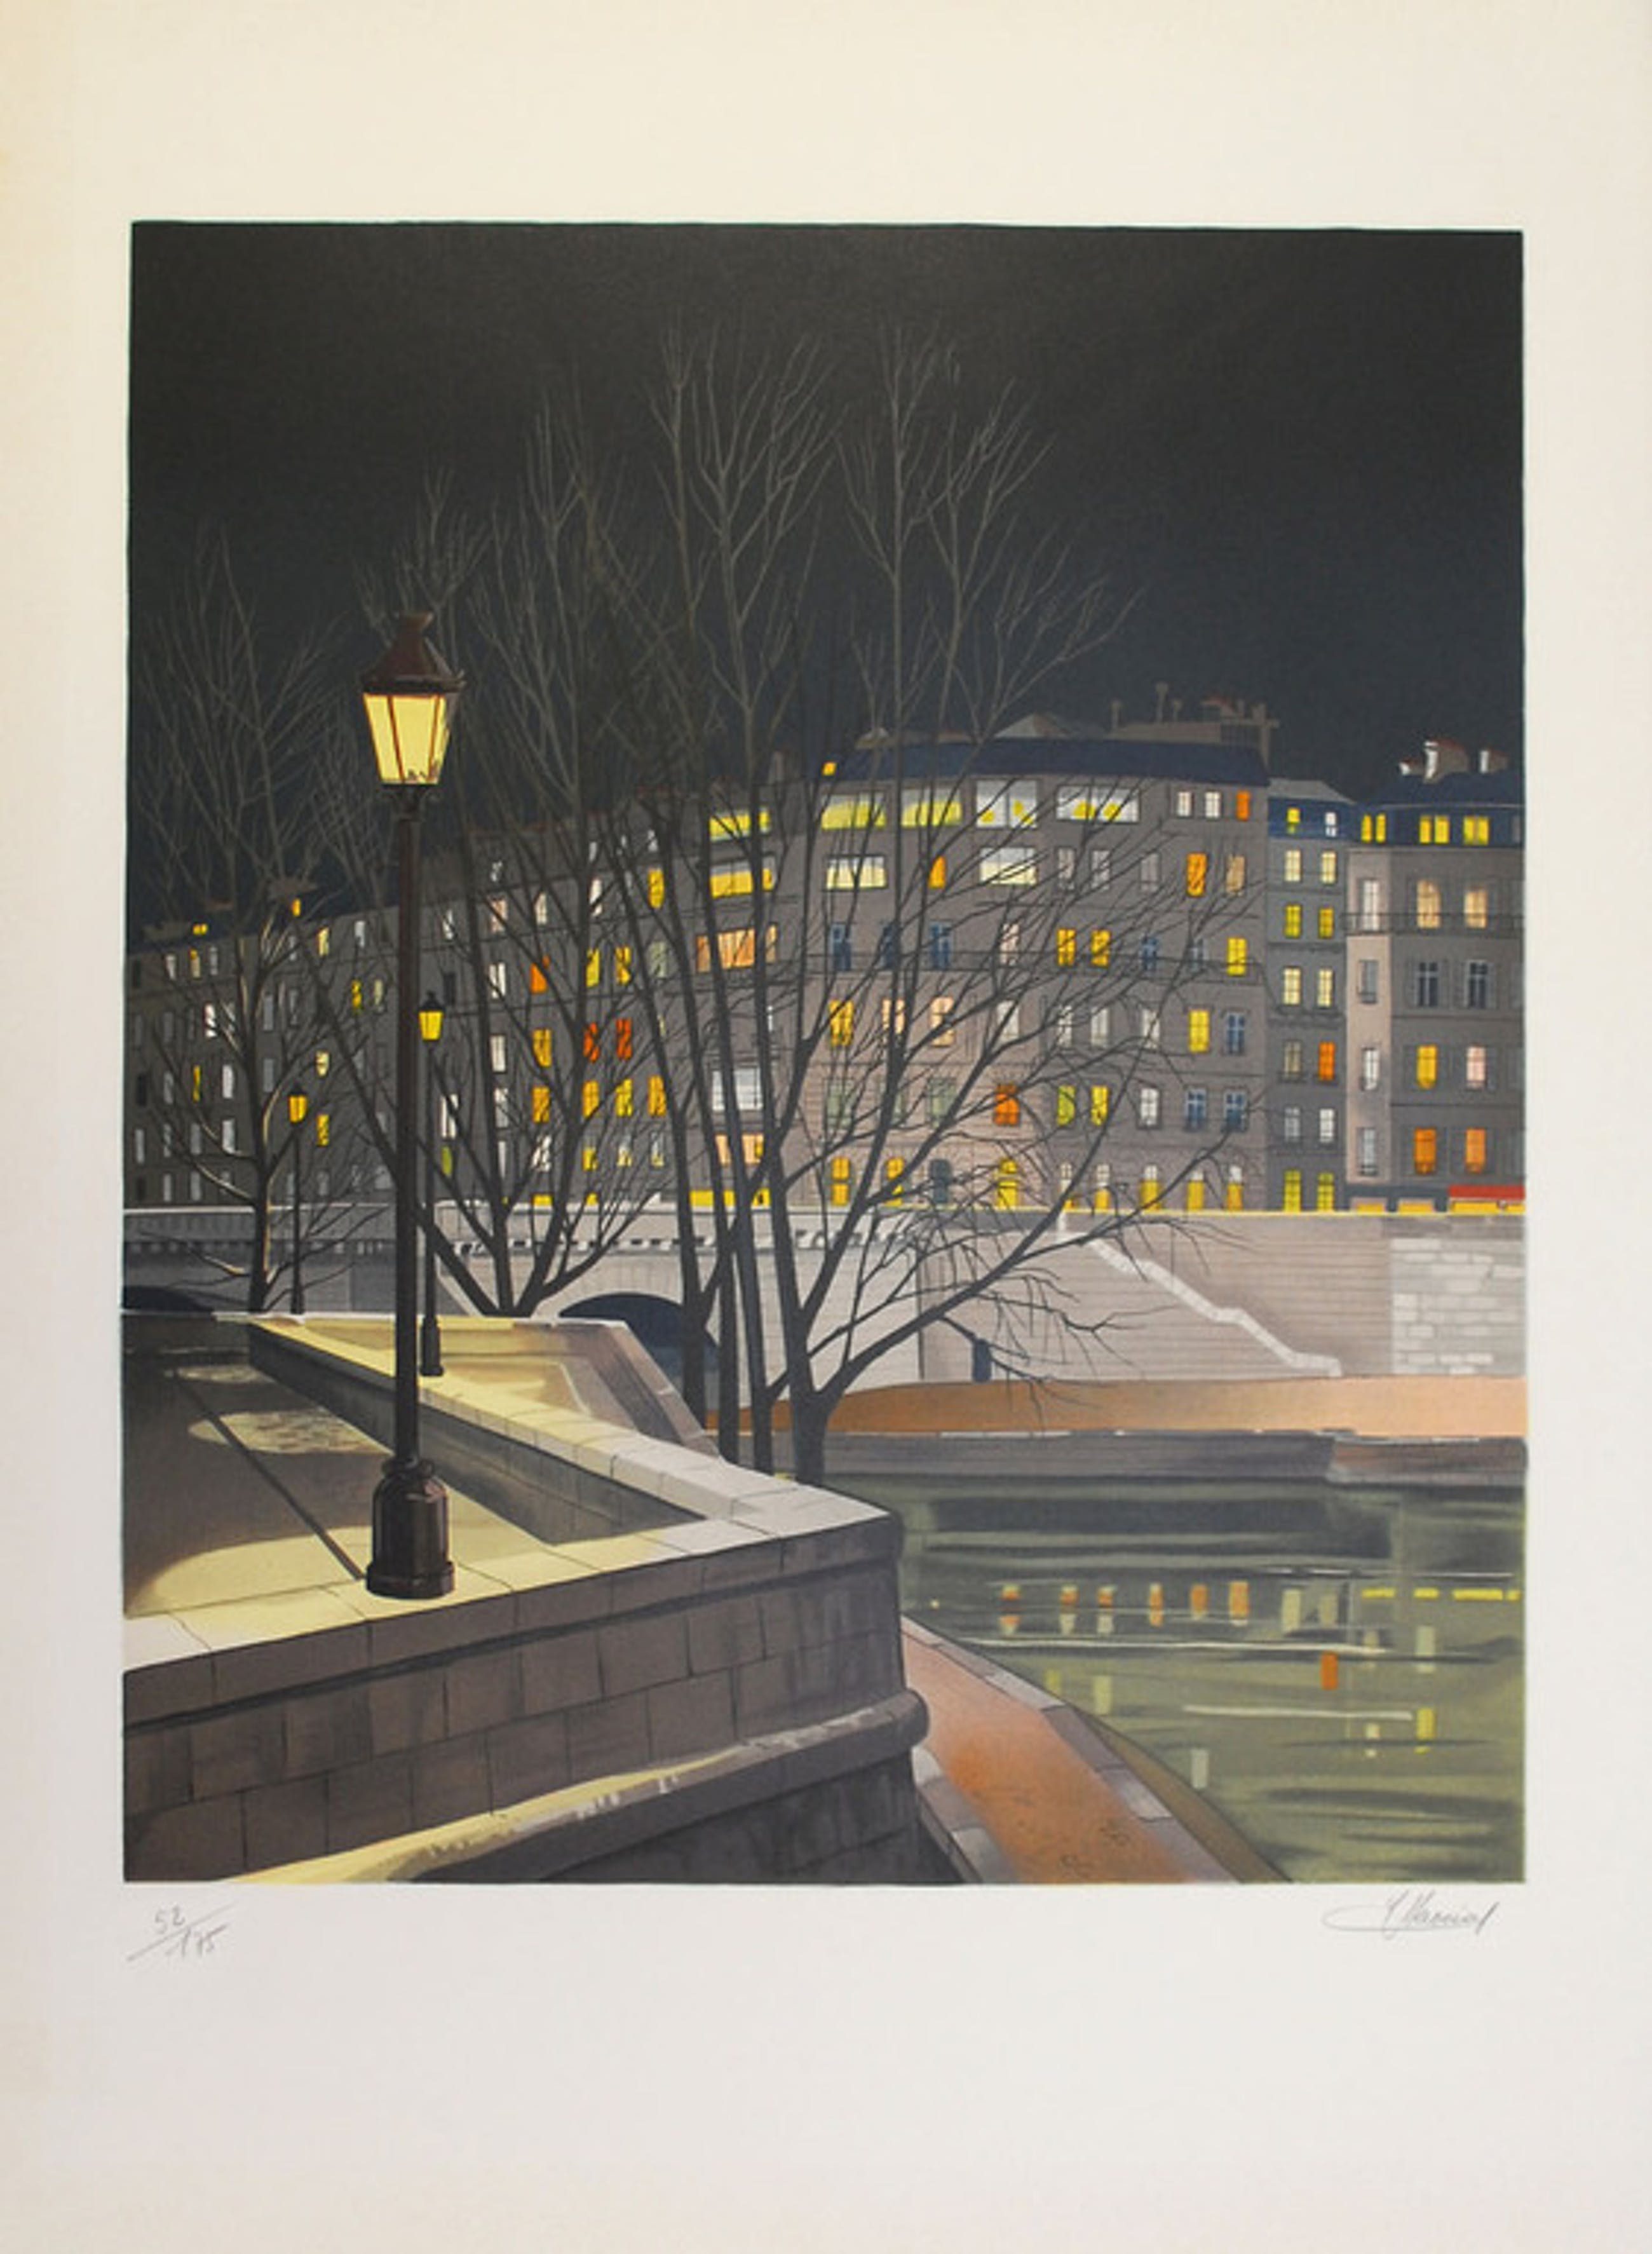 "Jean-Luc Lecoindre - ""Au bord du quai"" - kleuren litho - Hand gesigneerd kopen? Bied vanaf 45!"